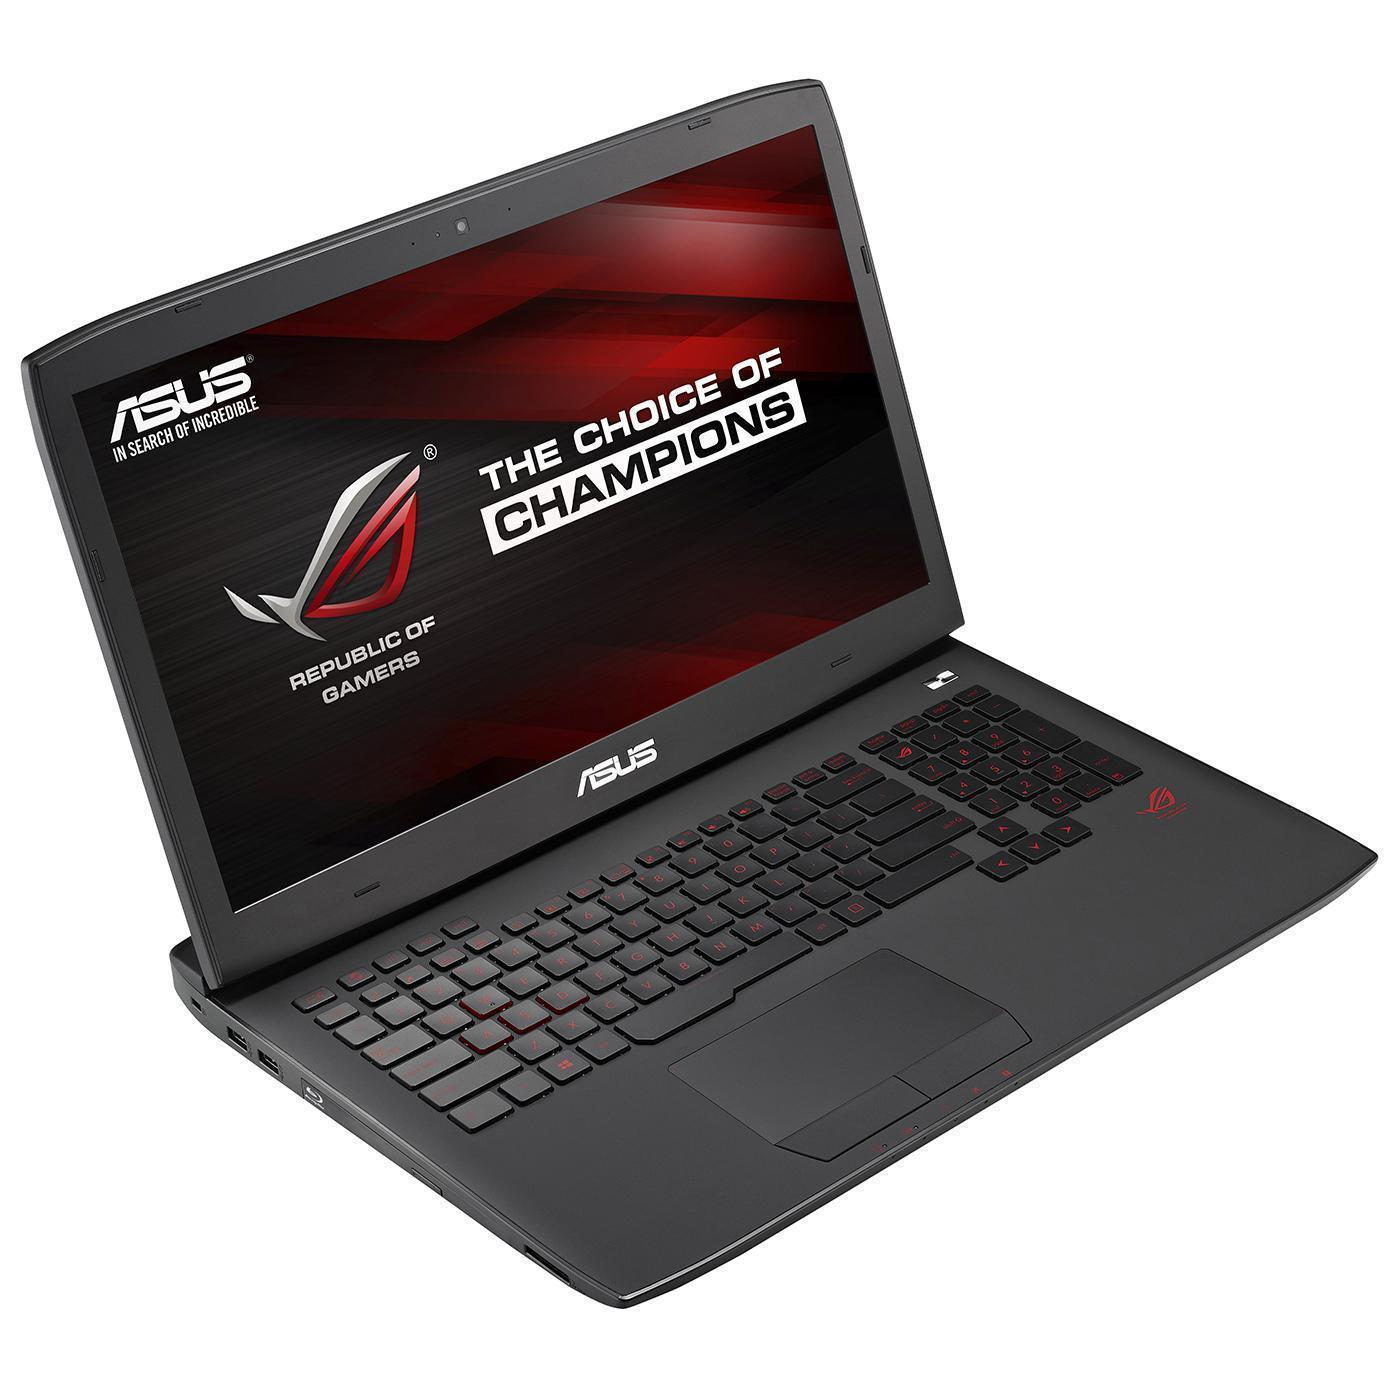 "Asus G751JM-T7048H 17,3"" Core i7-4710HQ 3,5 GHz  - SSD 128 Go + HDD 1 To - RAM 8 Go- NVIDIA GeForce GTX 860M"